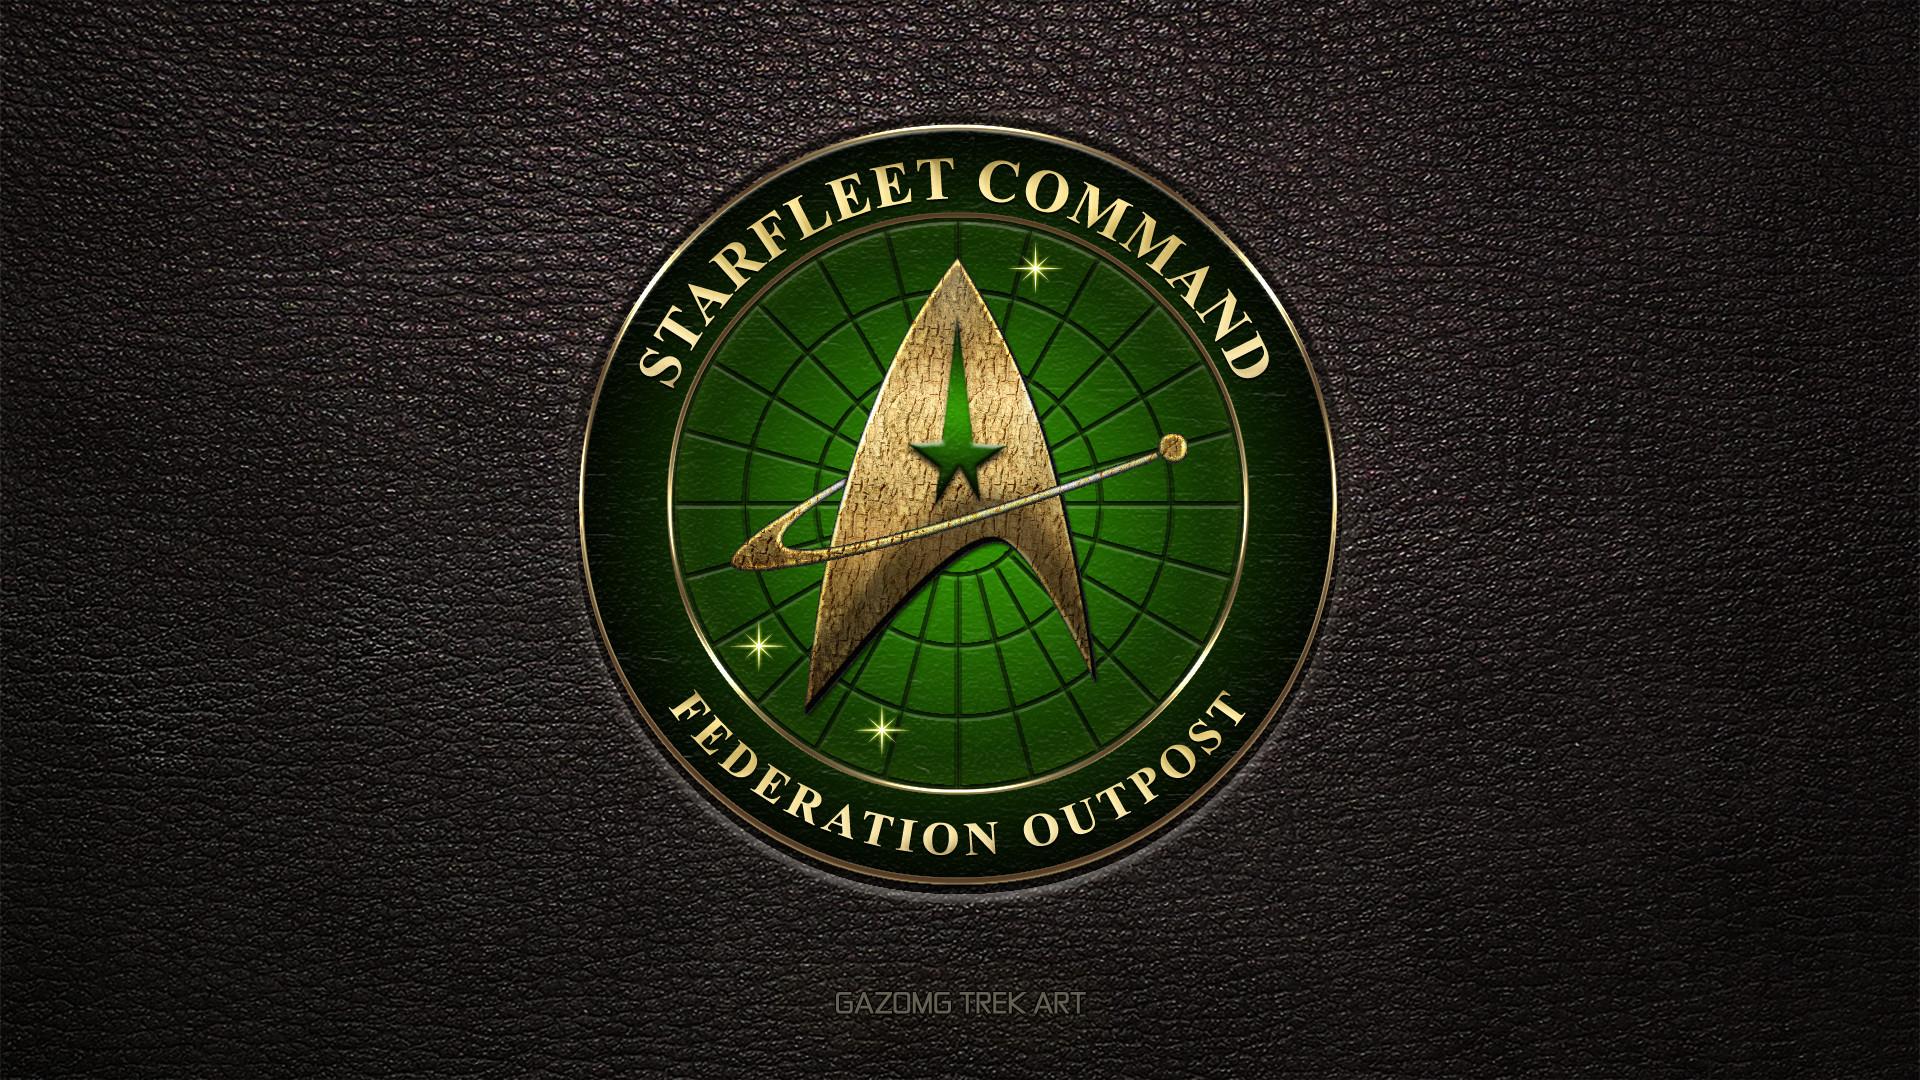 … Starfleet Federation Outpost Logo 2370s (updated) by gazomg